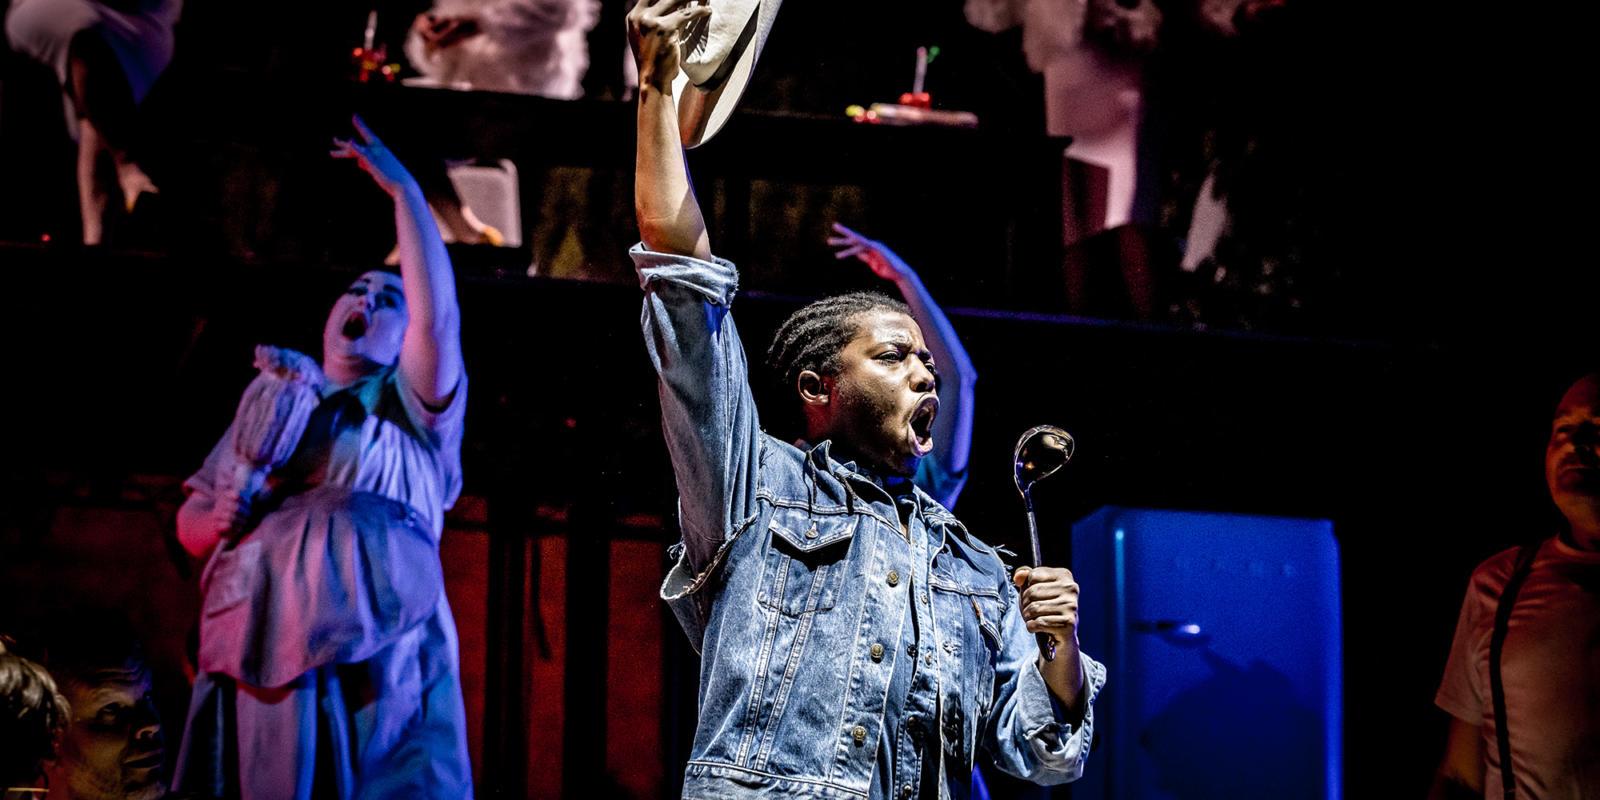 ENO Paul Bunyan at Alexandra Palace 2019: Zwakele Tshabalala (c) Lloyd Winters